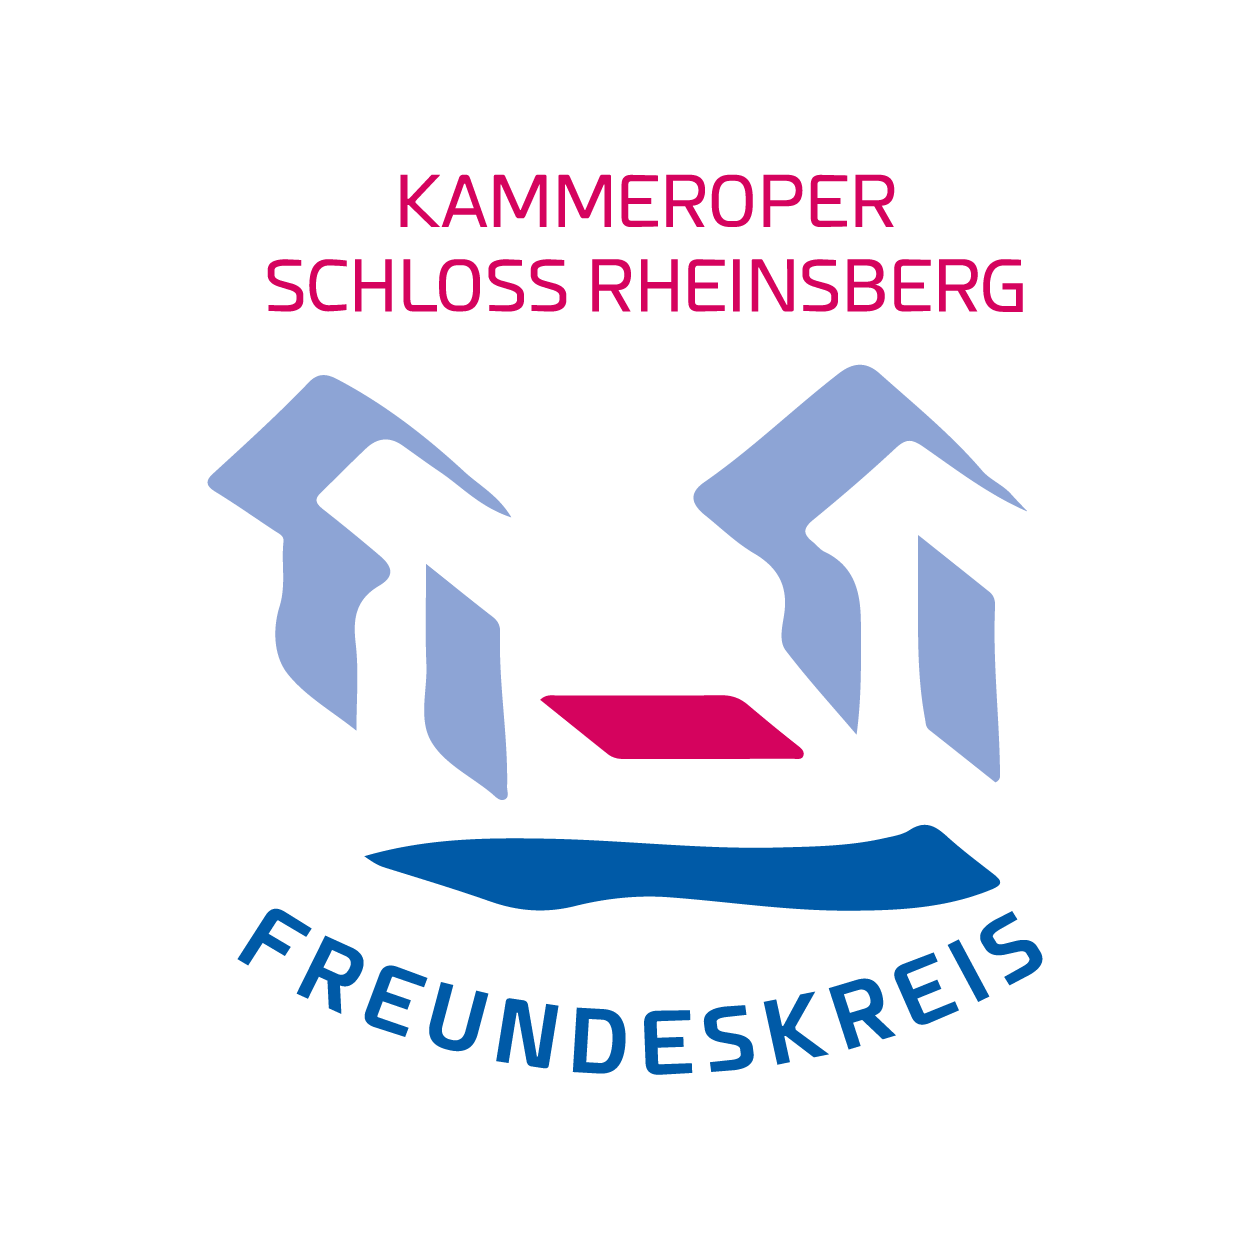 Kammeroper Schloss Rheinsberg Freundeskreis